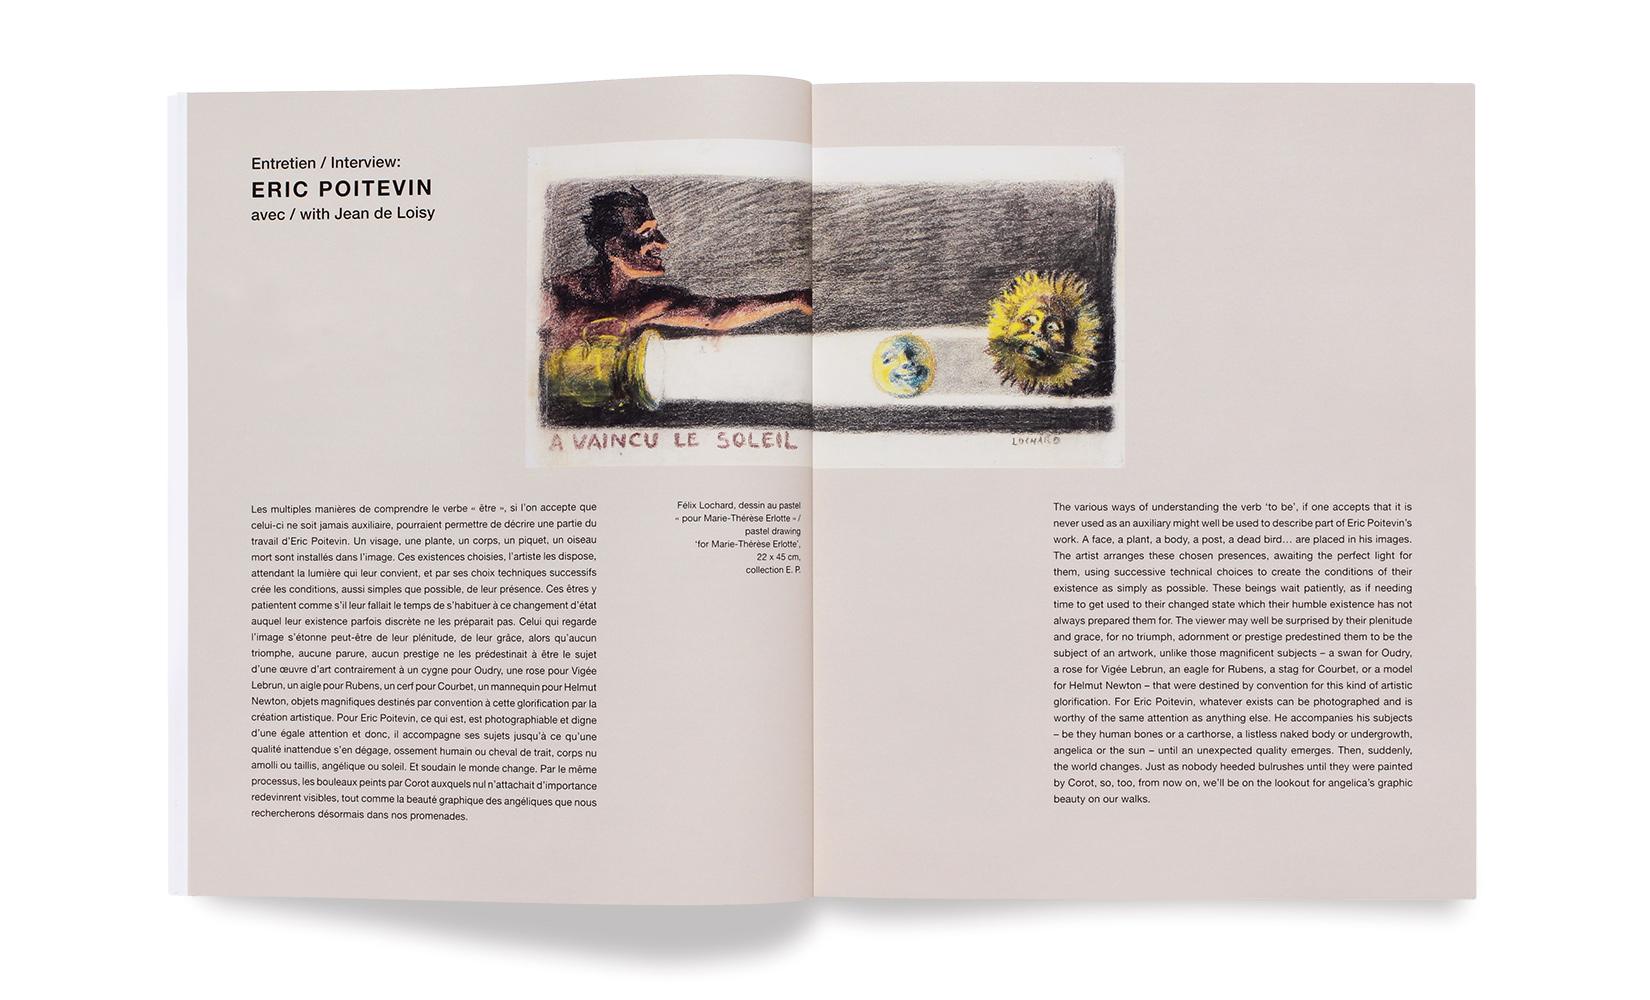 versailles-visible-invisible-toluca-studio-olivier-andreotti-POITEVIN-3.jpg